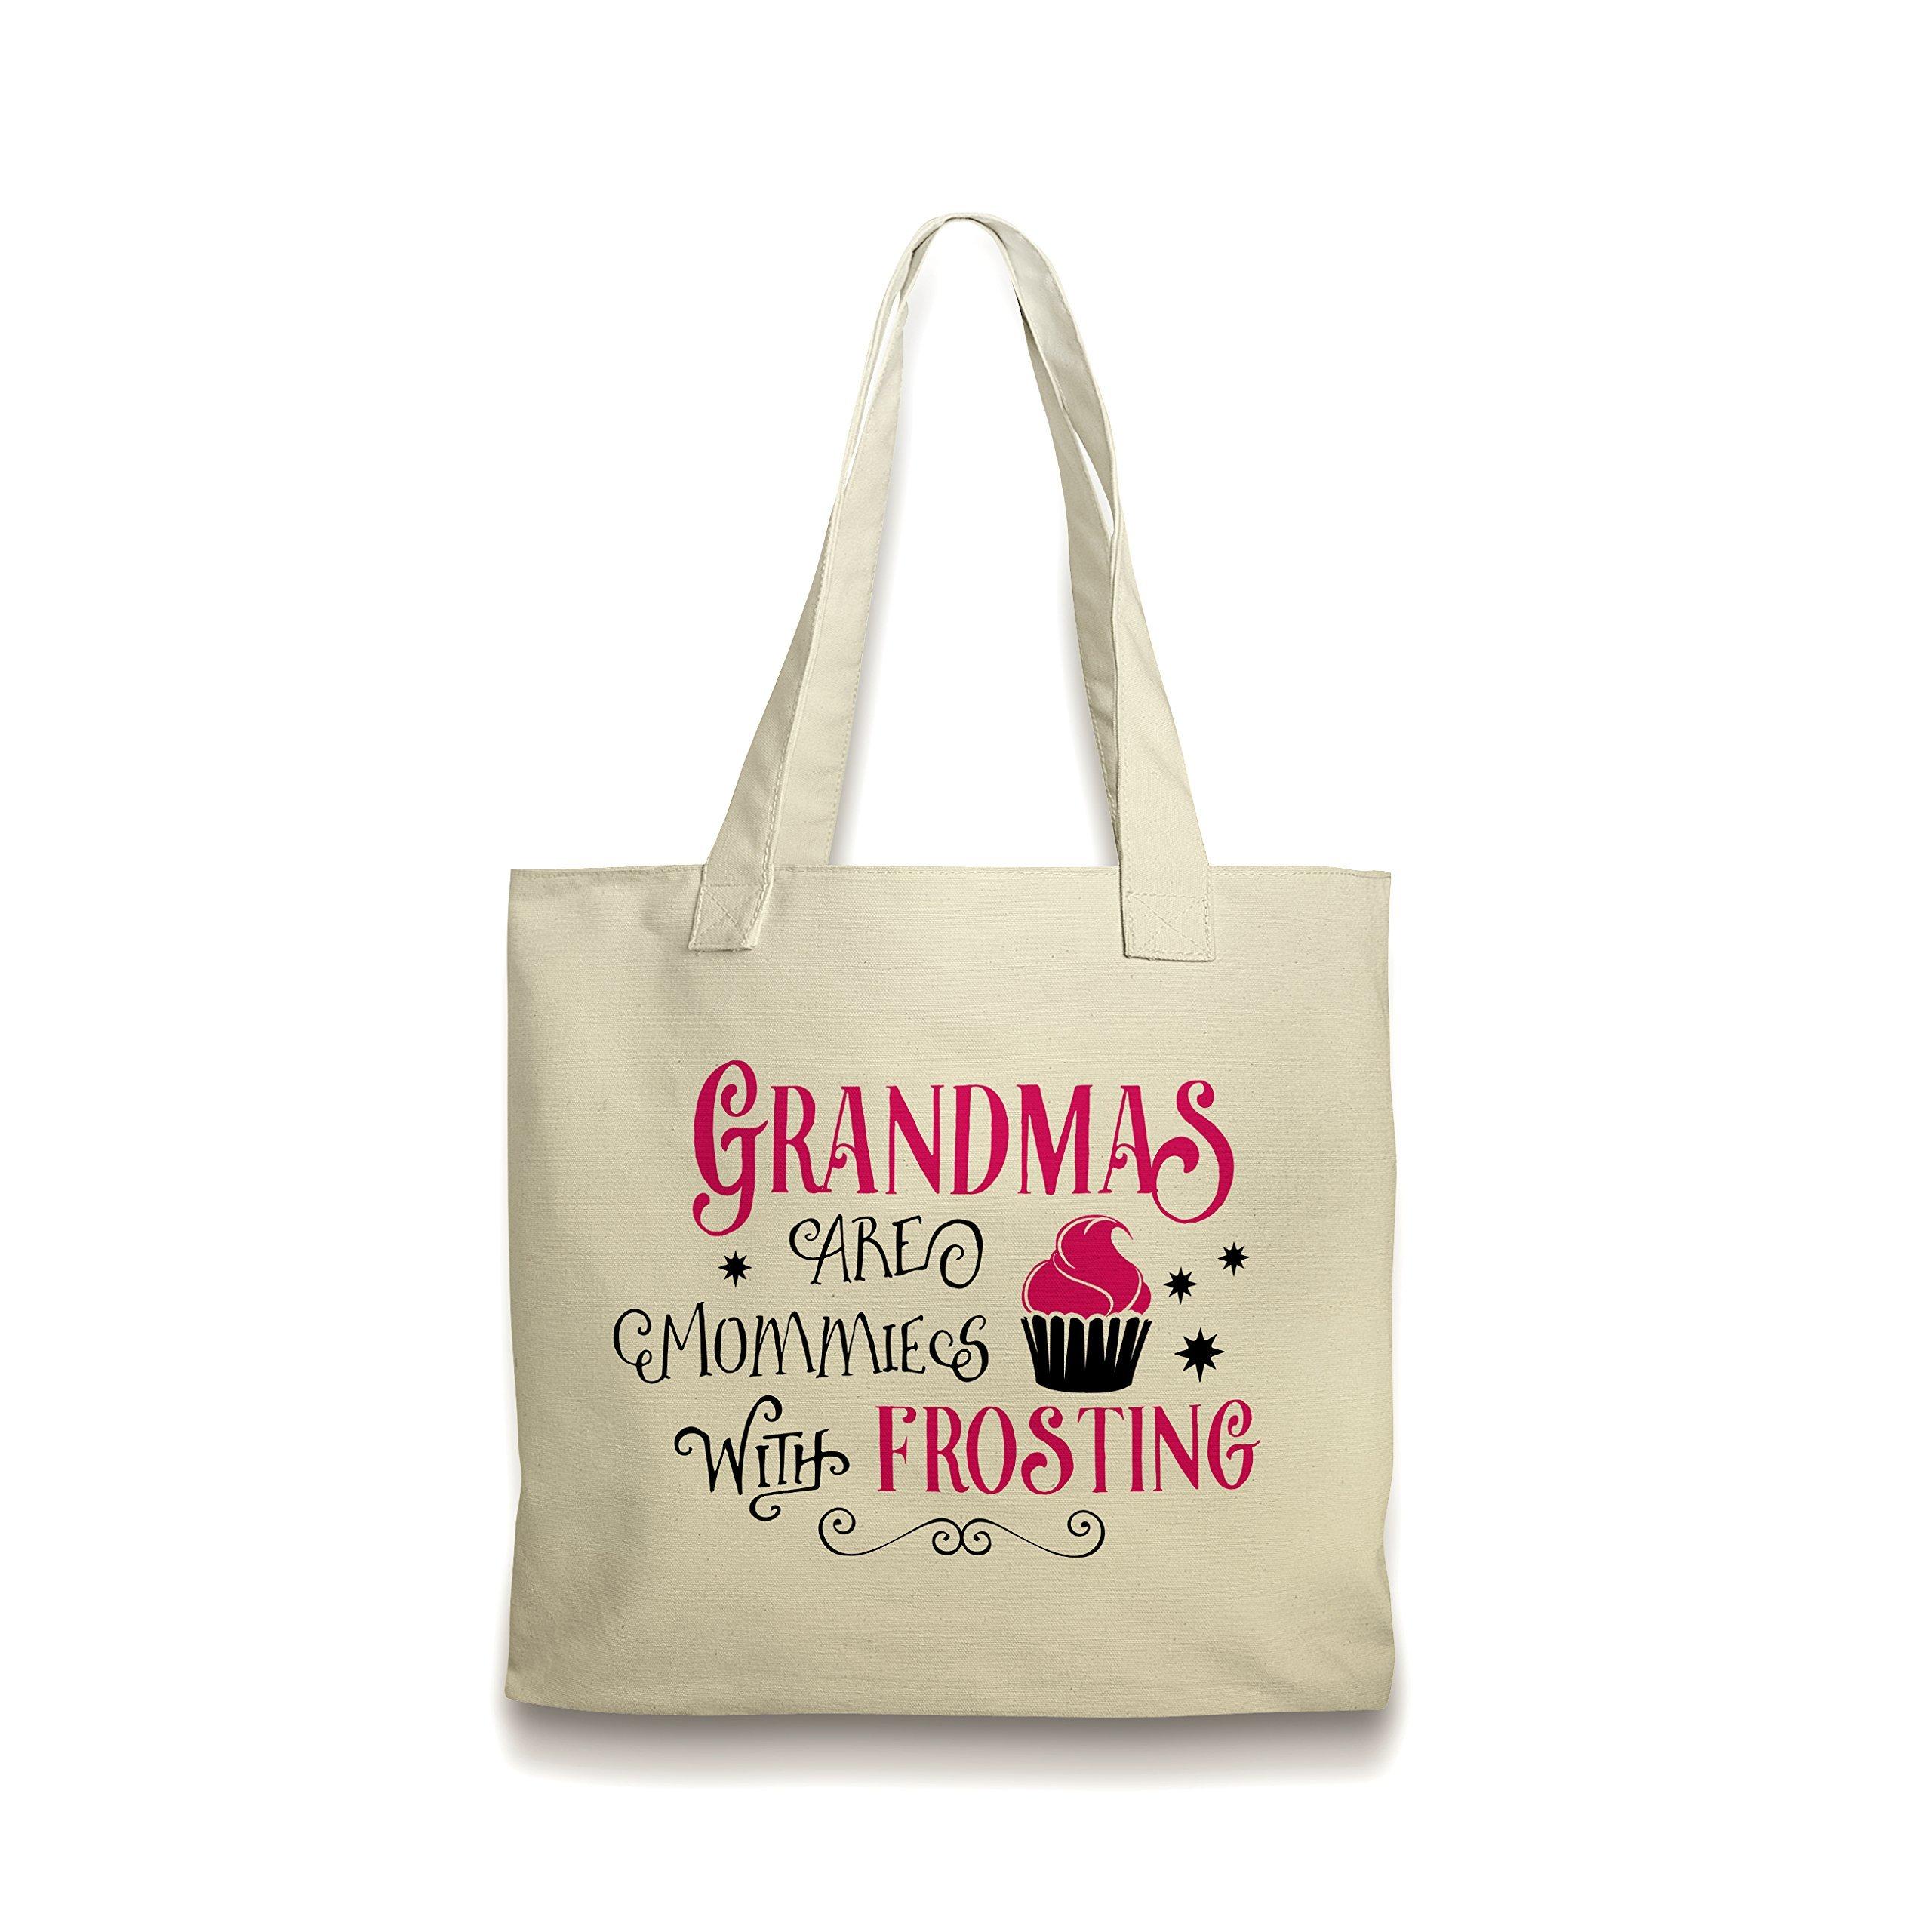 Grandma Tote Bag Canvas Pink Cupcake Frosting Gift for Grandmother by Joyful Moose